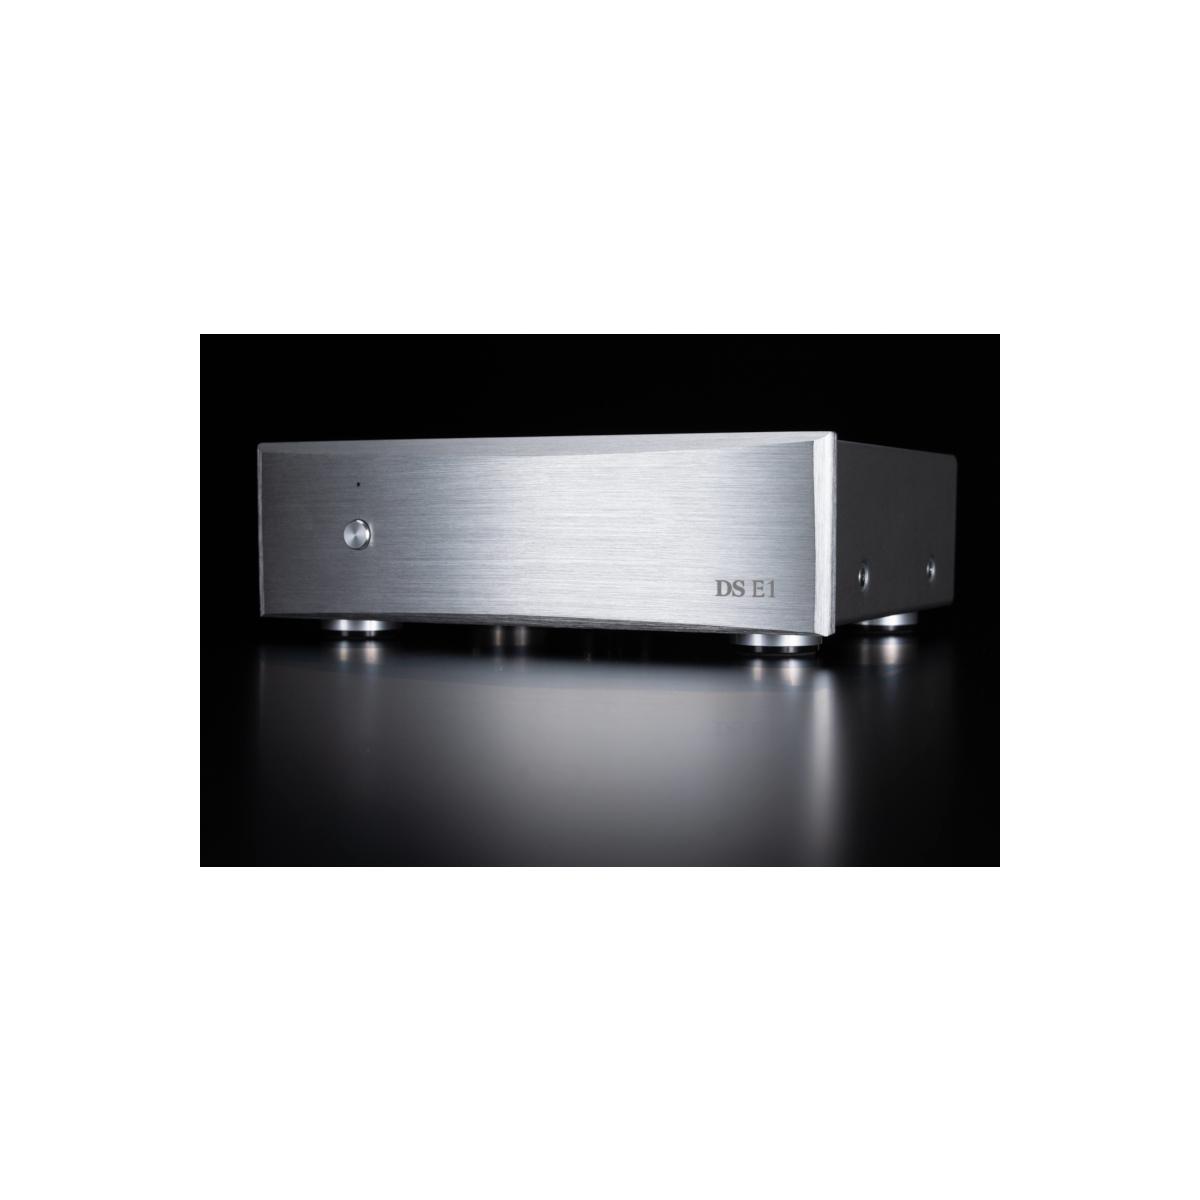 DS Audio DS-E1 イコライザー  ディーエスオーディオ 光カートリッジ専用フォノイコライザー